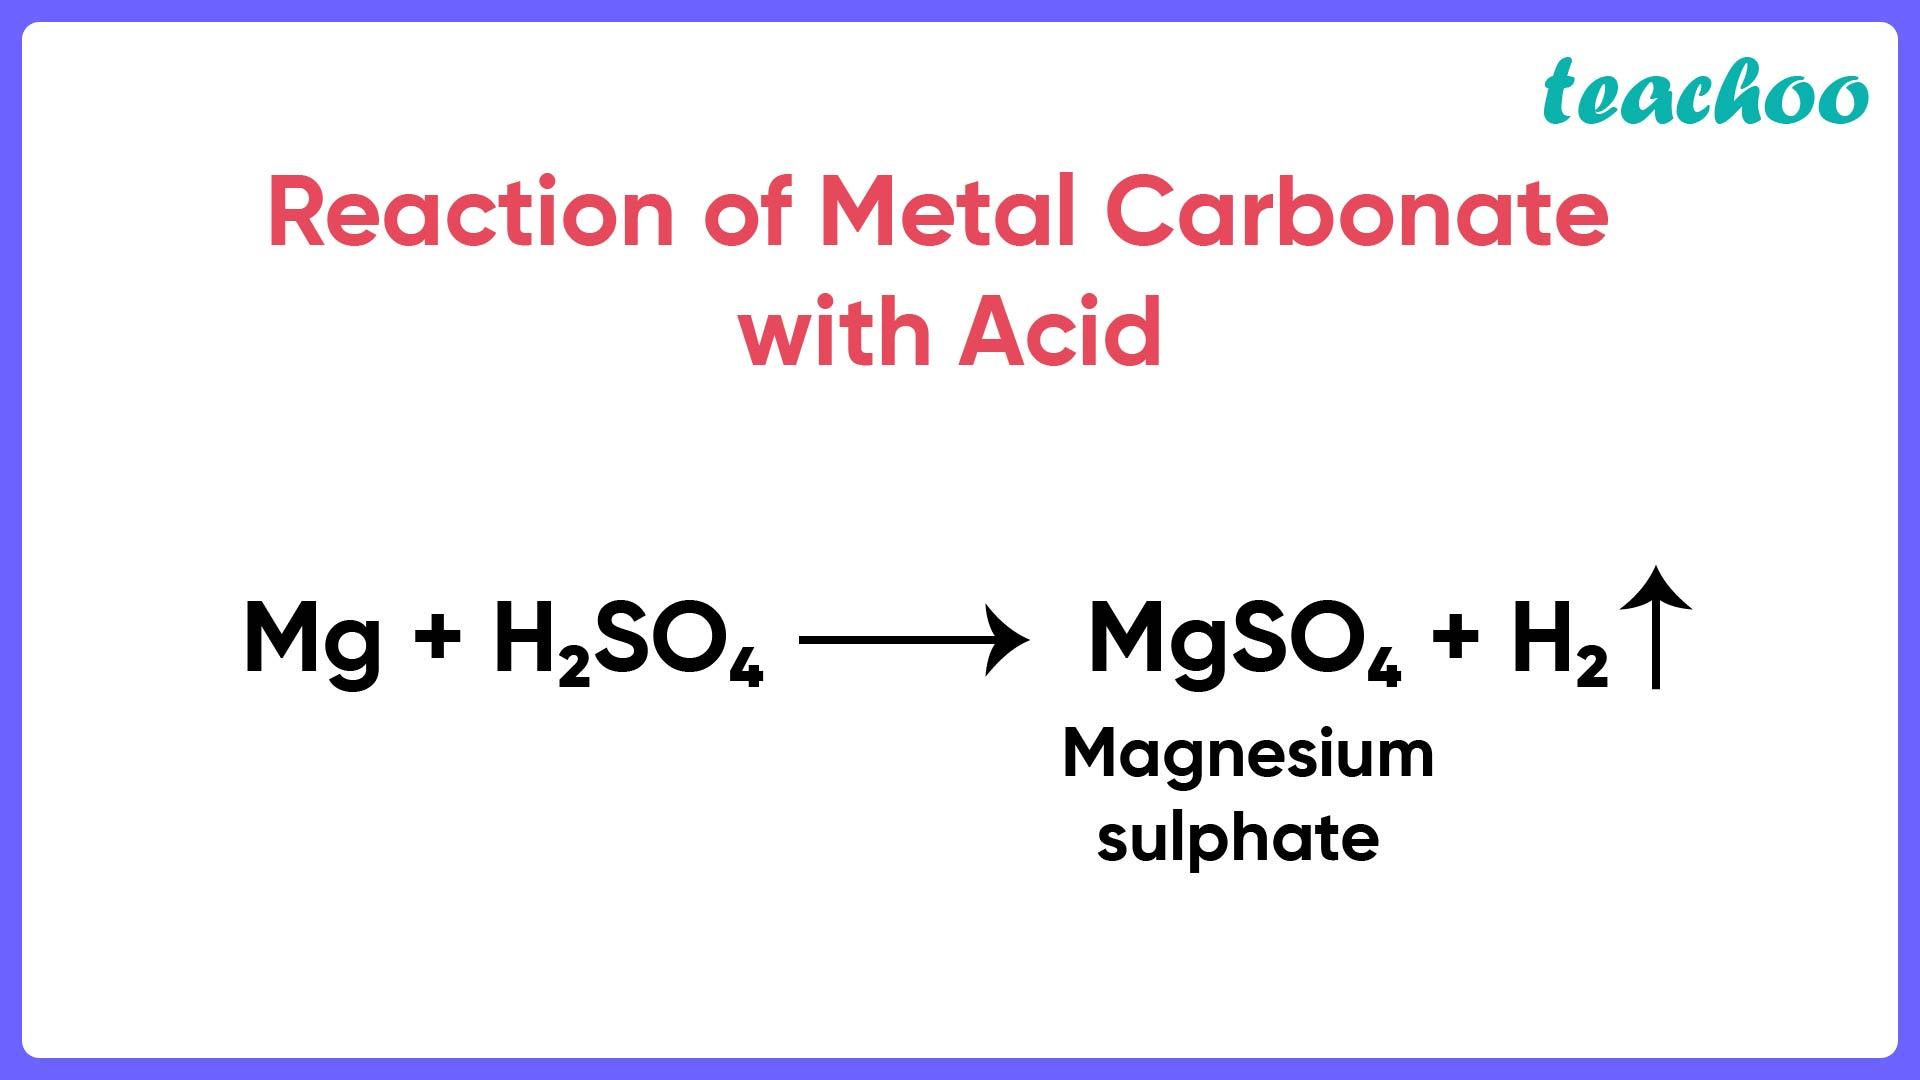 Reaction of Metals with Acids - Teachoo.jpg